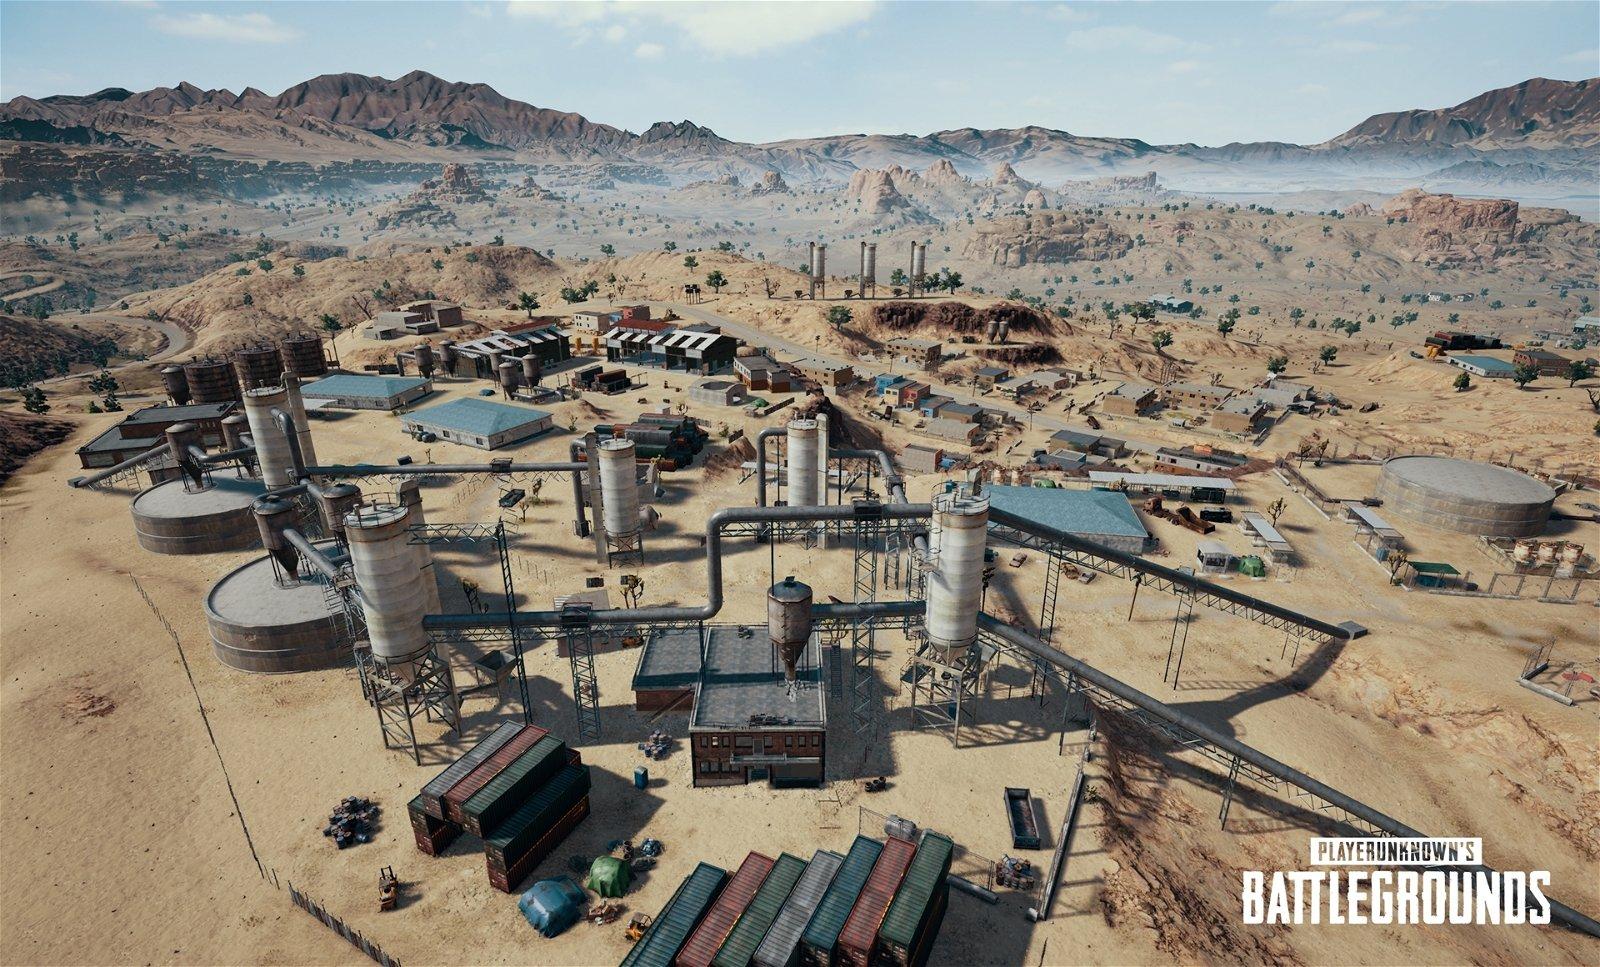 PUBG Unveils New Desert Map Ahead of 1.0 Release